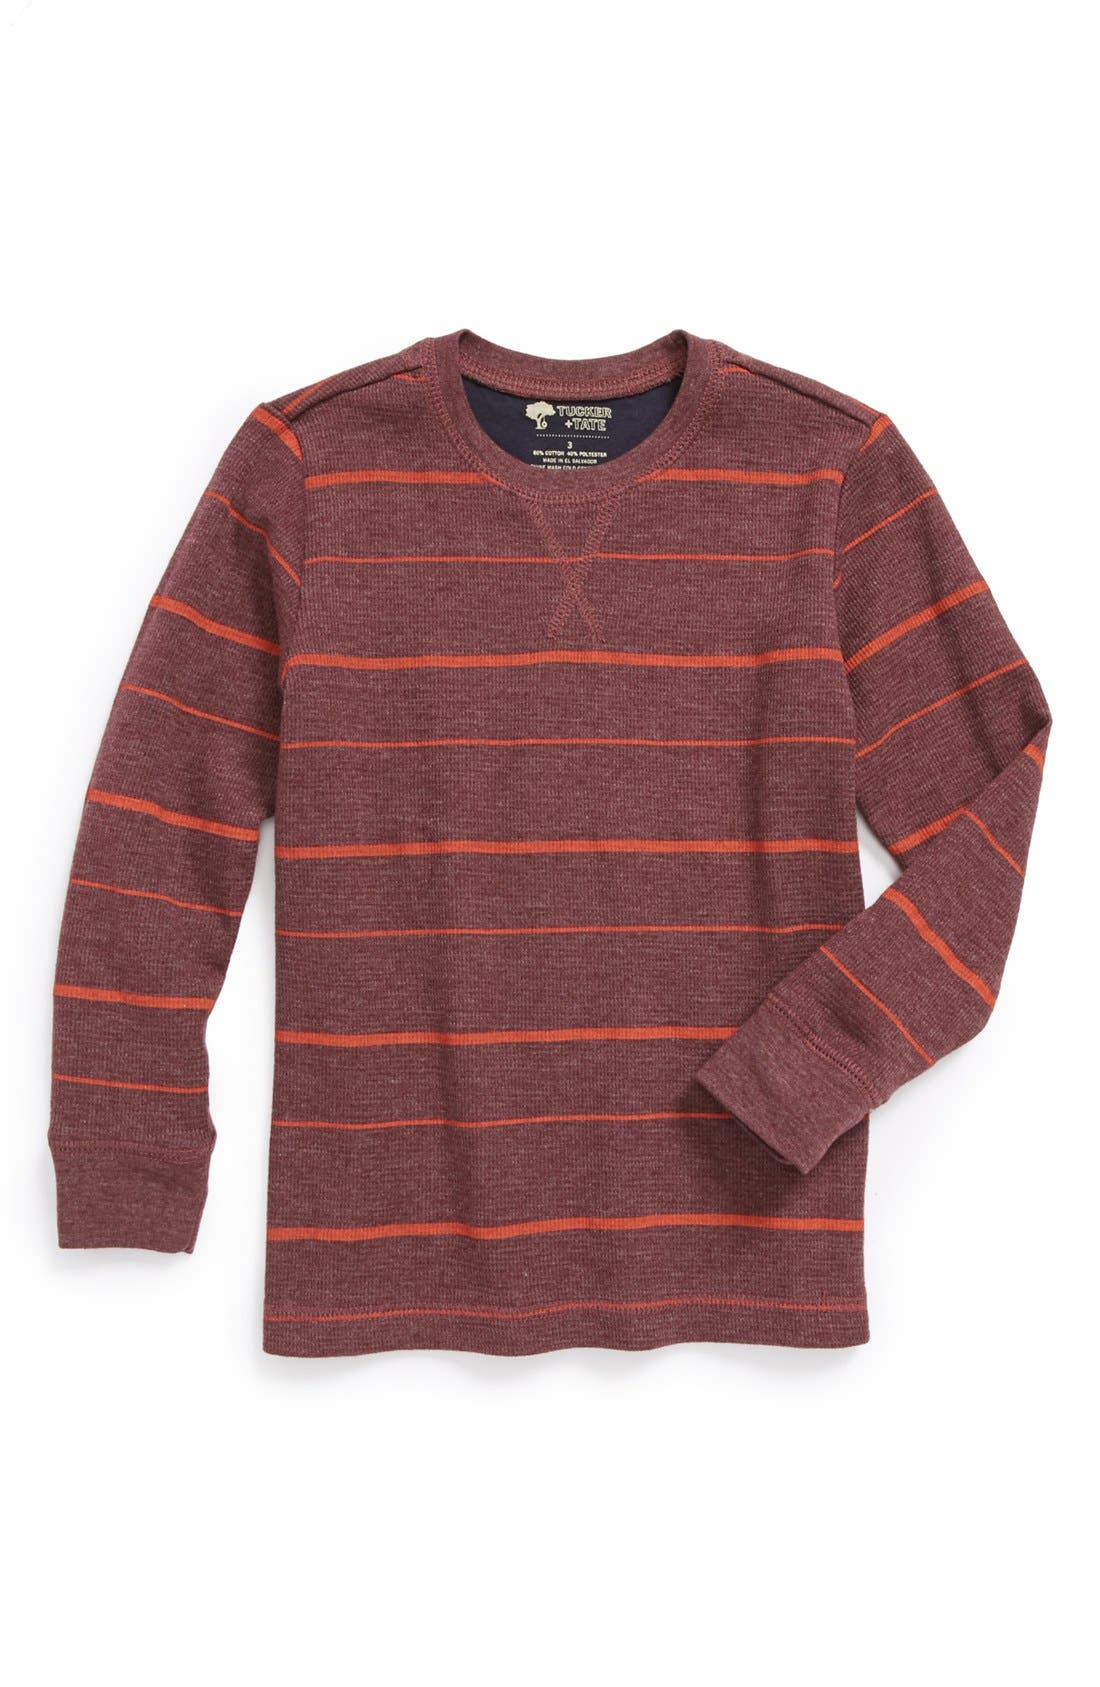 Main Image - Tucker + Tate 'Sultan' Long Sleeve Shirt (Big Boys) (Online Only)